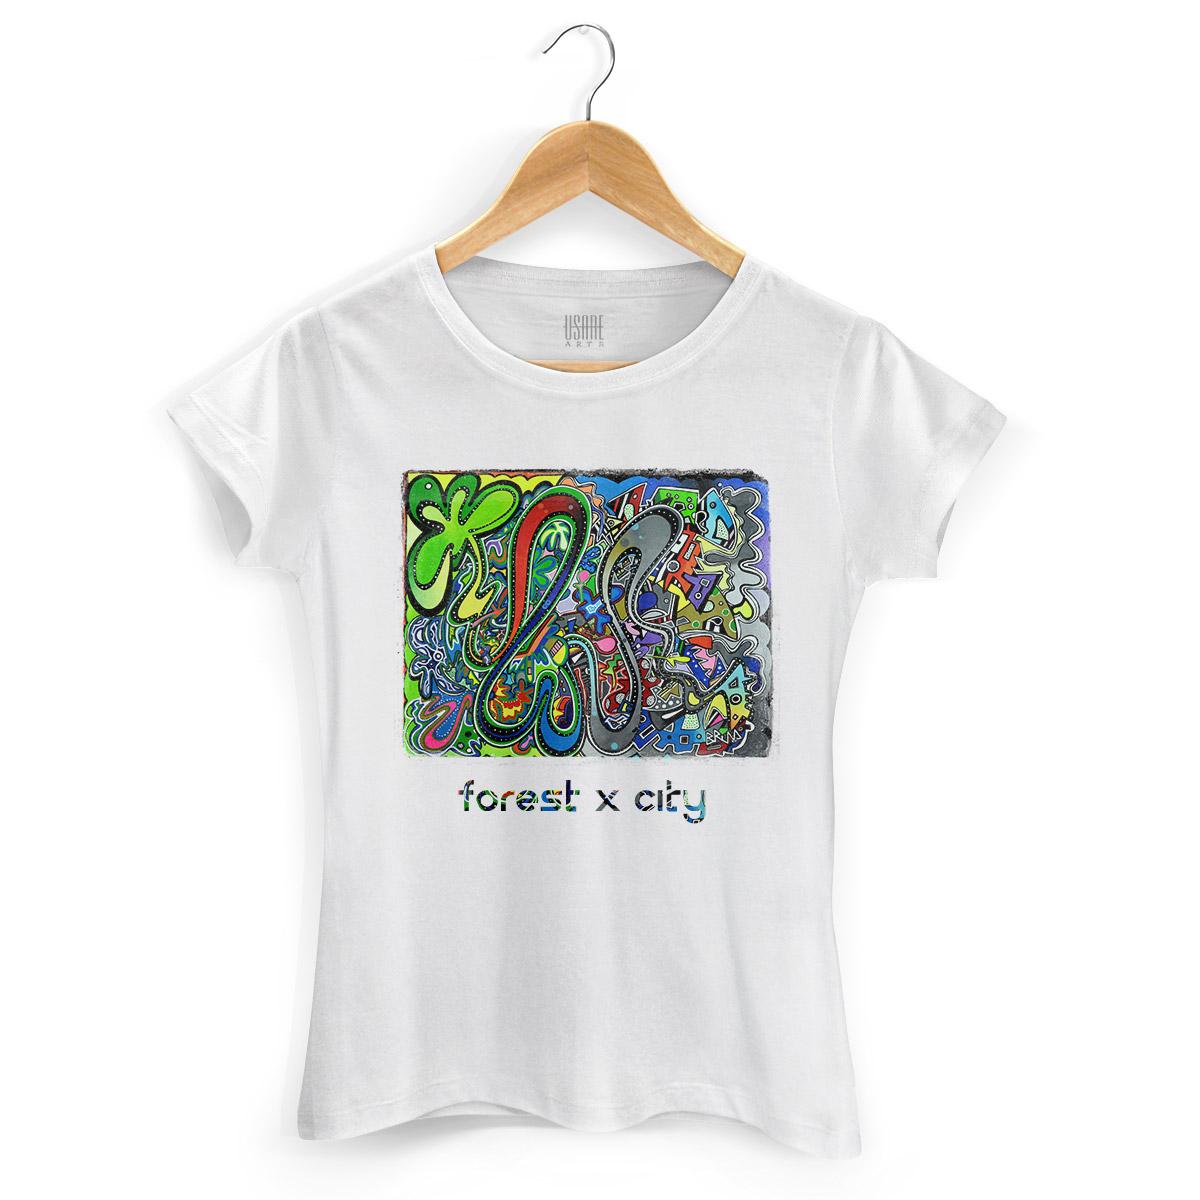 Camiseta Feminina Bruna Forest x City